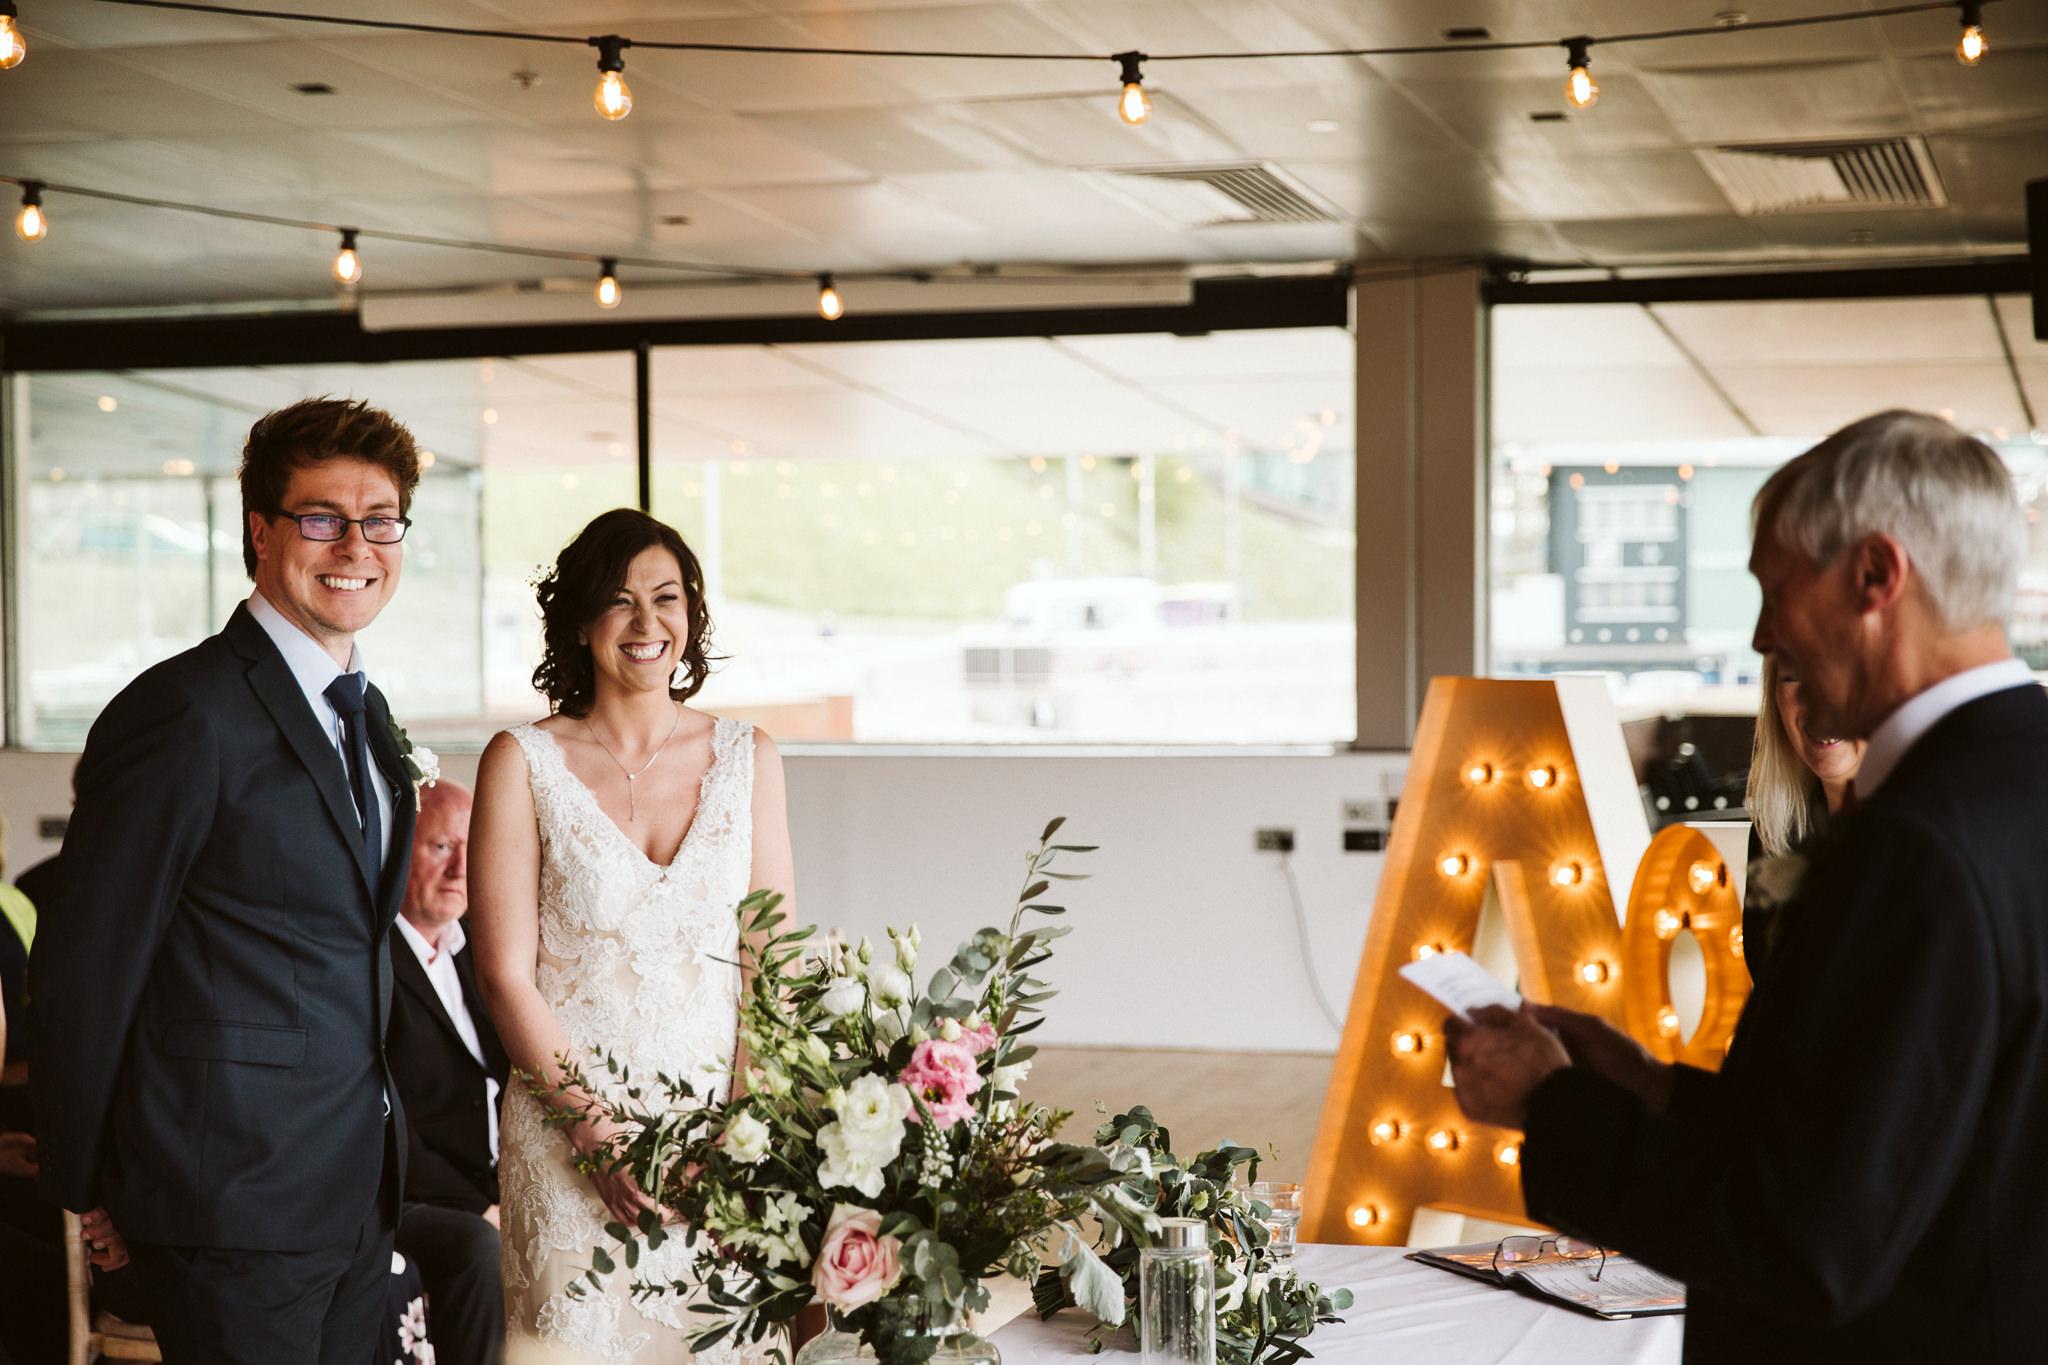 baltic-wedding-margarita-hope (24).jpg